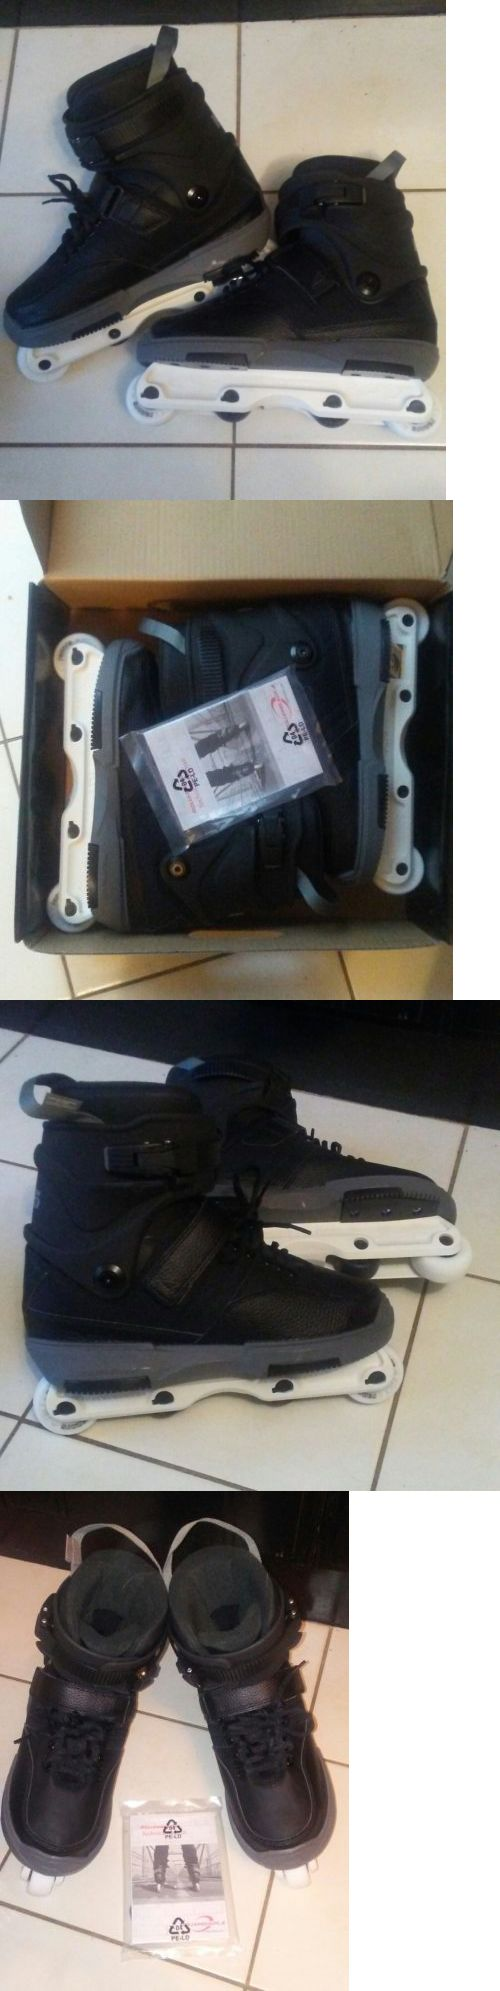 Men 47346: Rollerblade Nj5 Aggressive Inline Skates Size 9 -> BUY IT NOW ONLY: $160 on eBay!